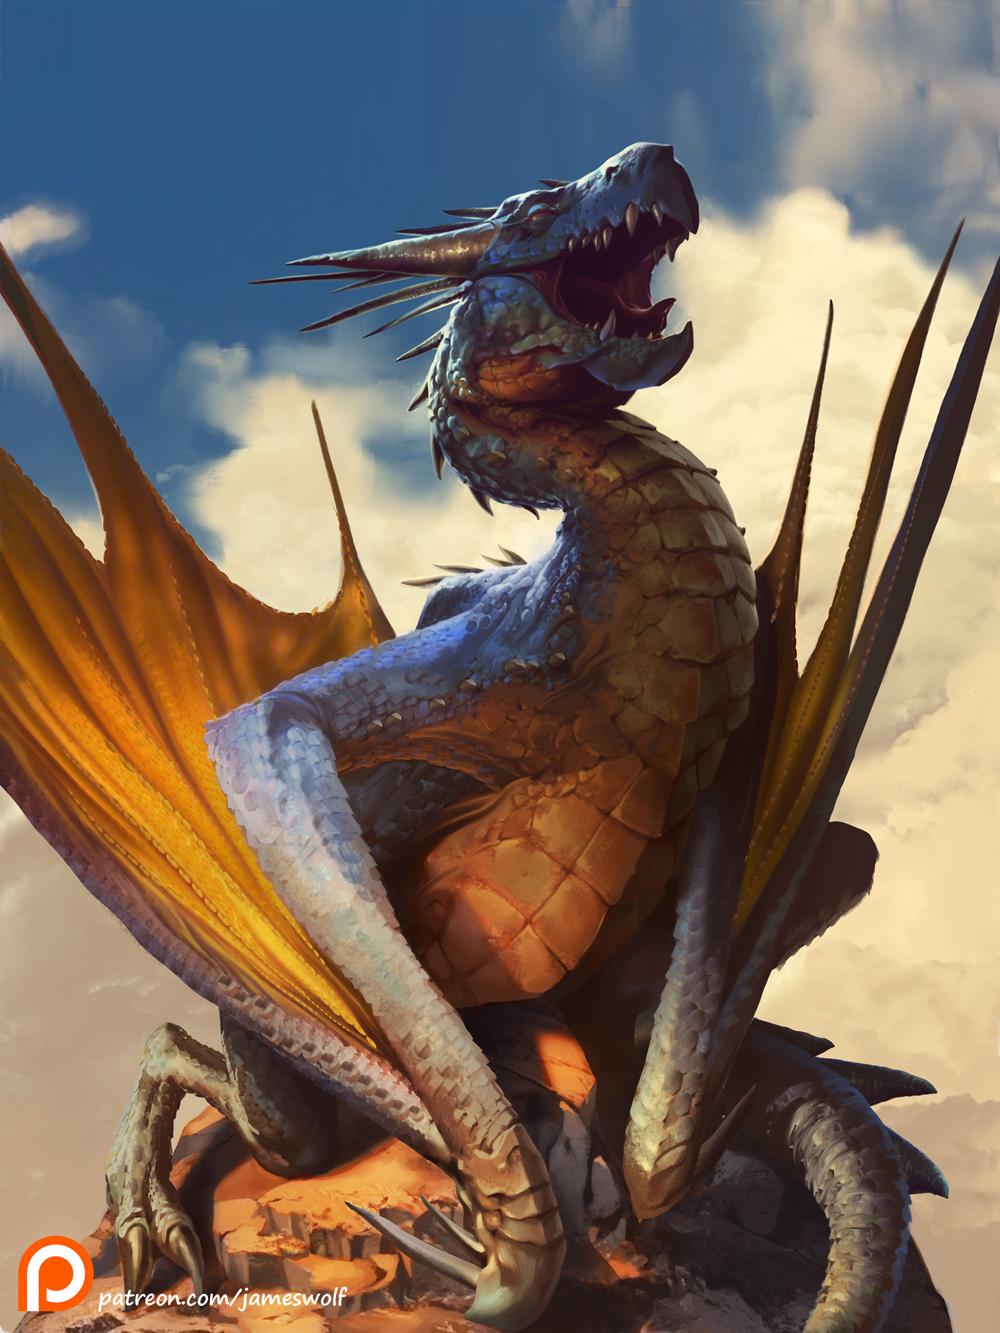 Jameswolf sunbathing dragon 1 1f3c1319 bq4d